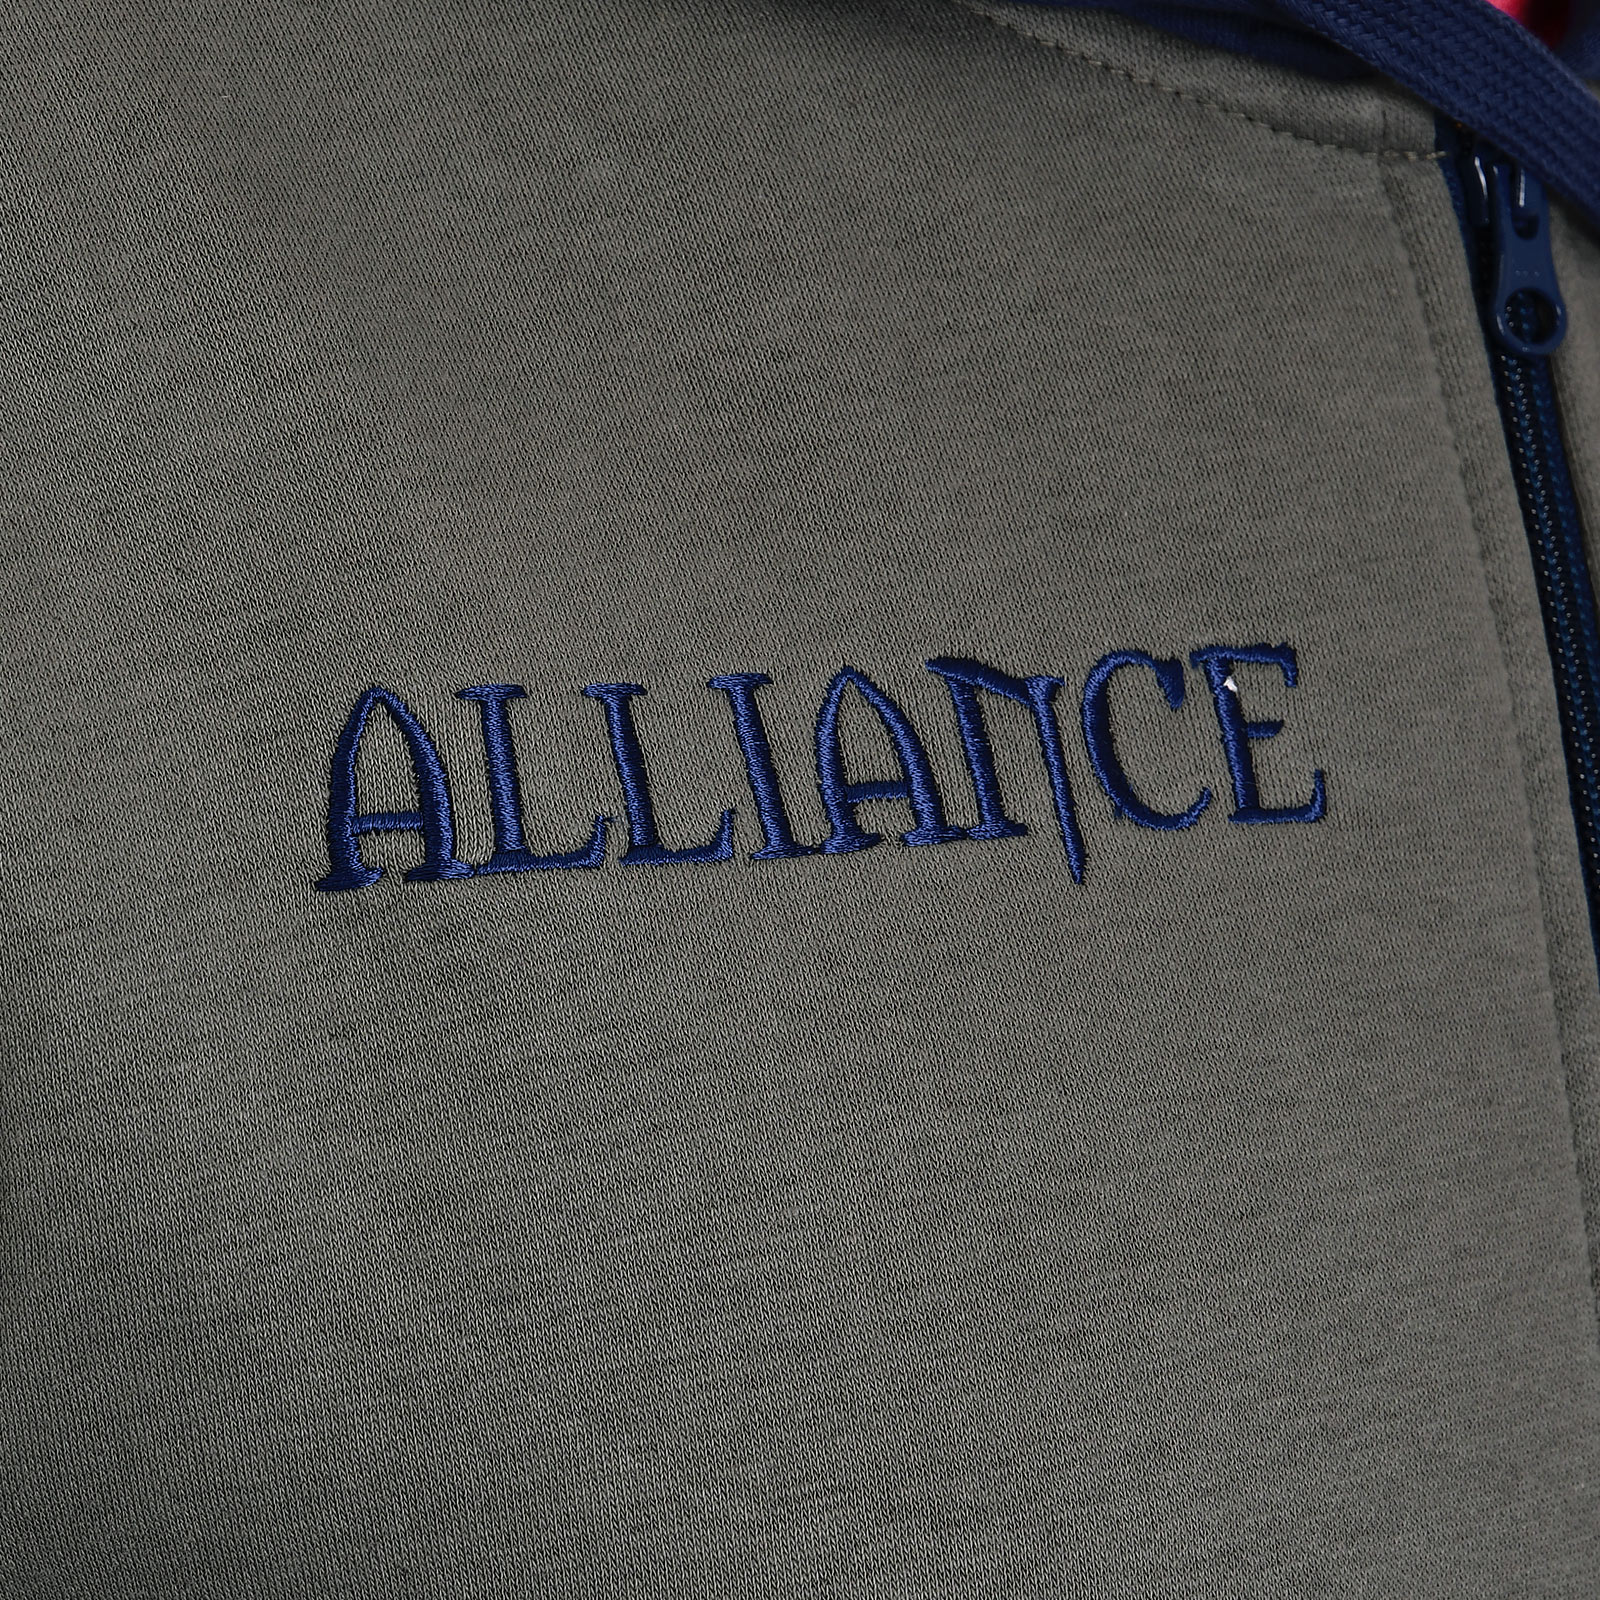 World of Warcraft - Team Alliance Kapuzenjacke deluxe